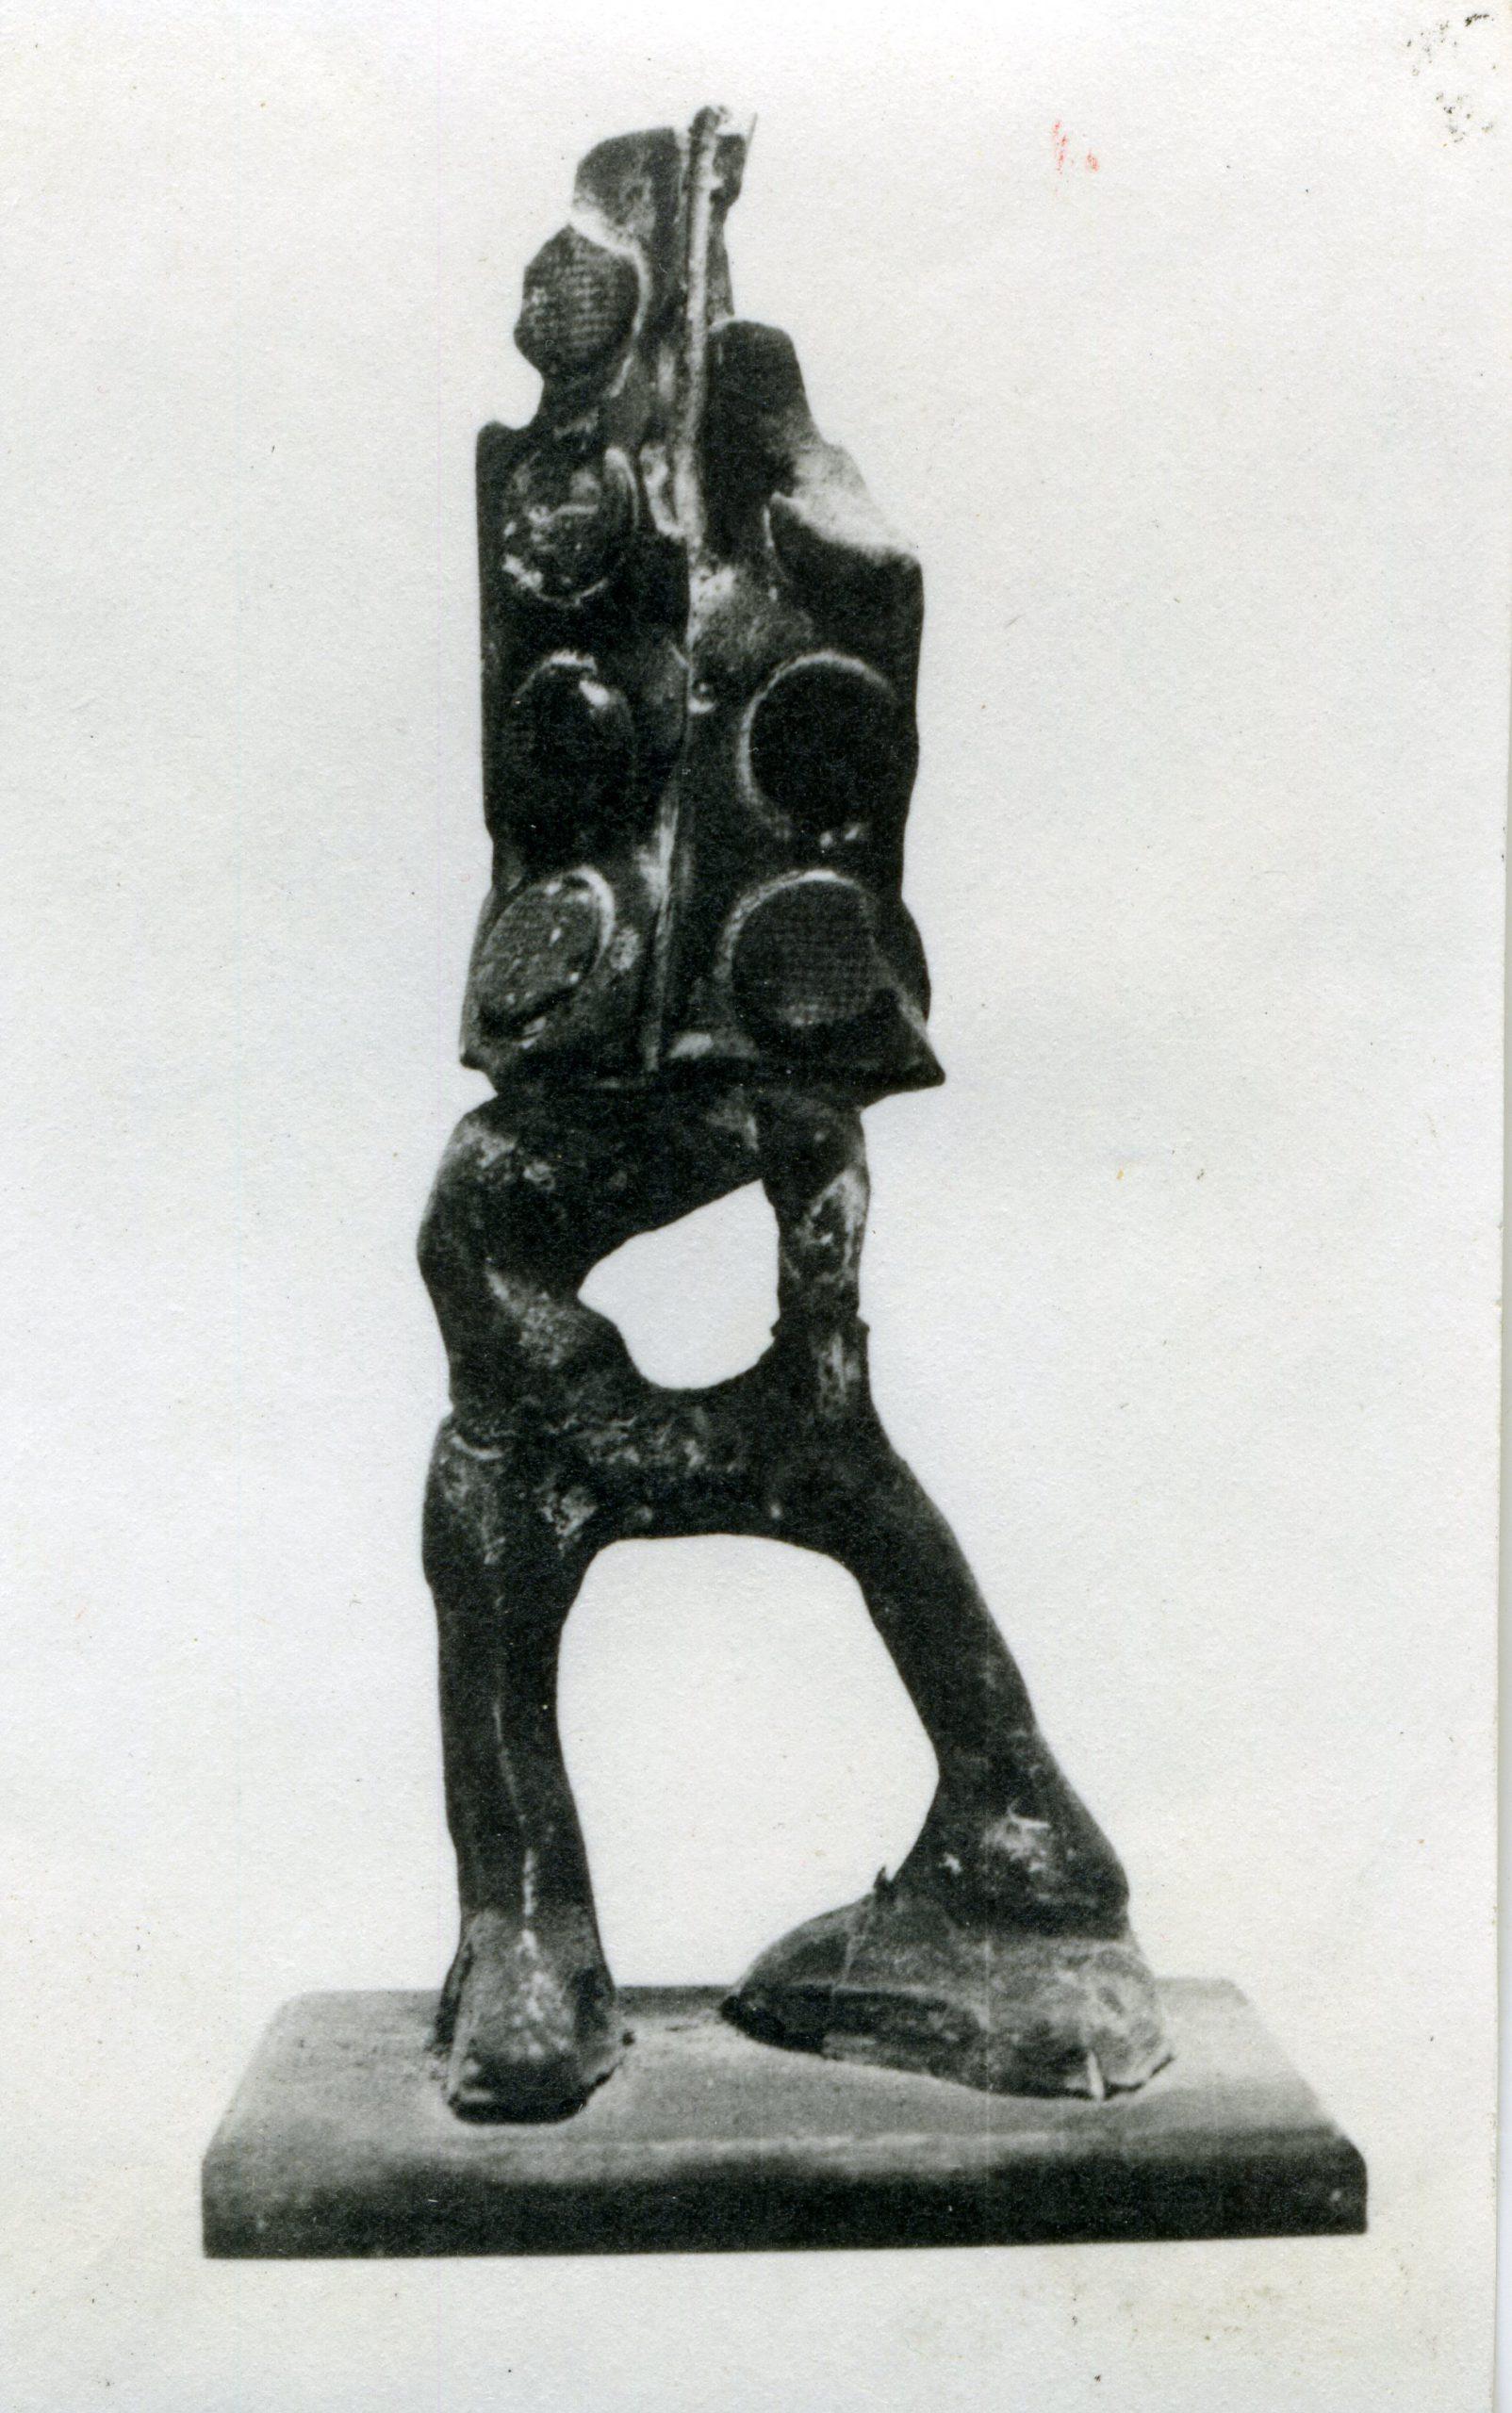 Sculpture resembles figure.